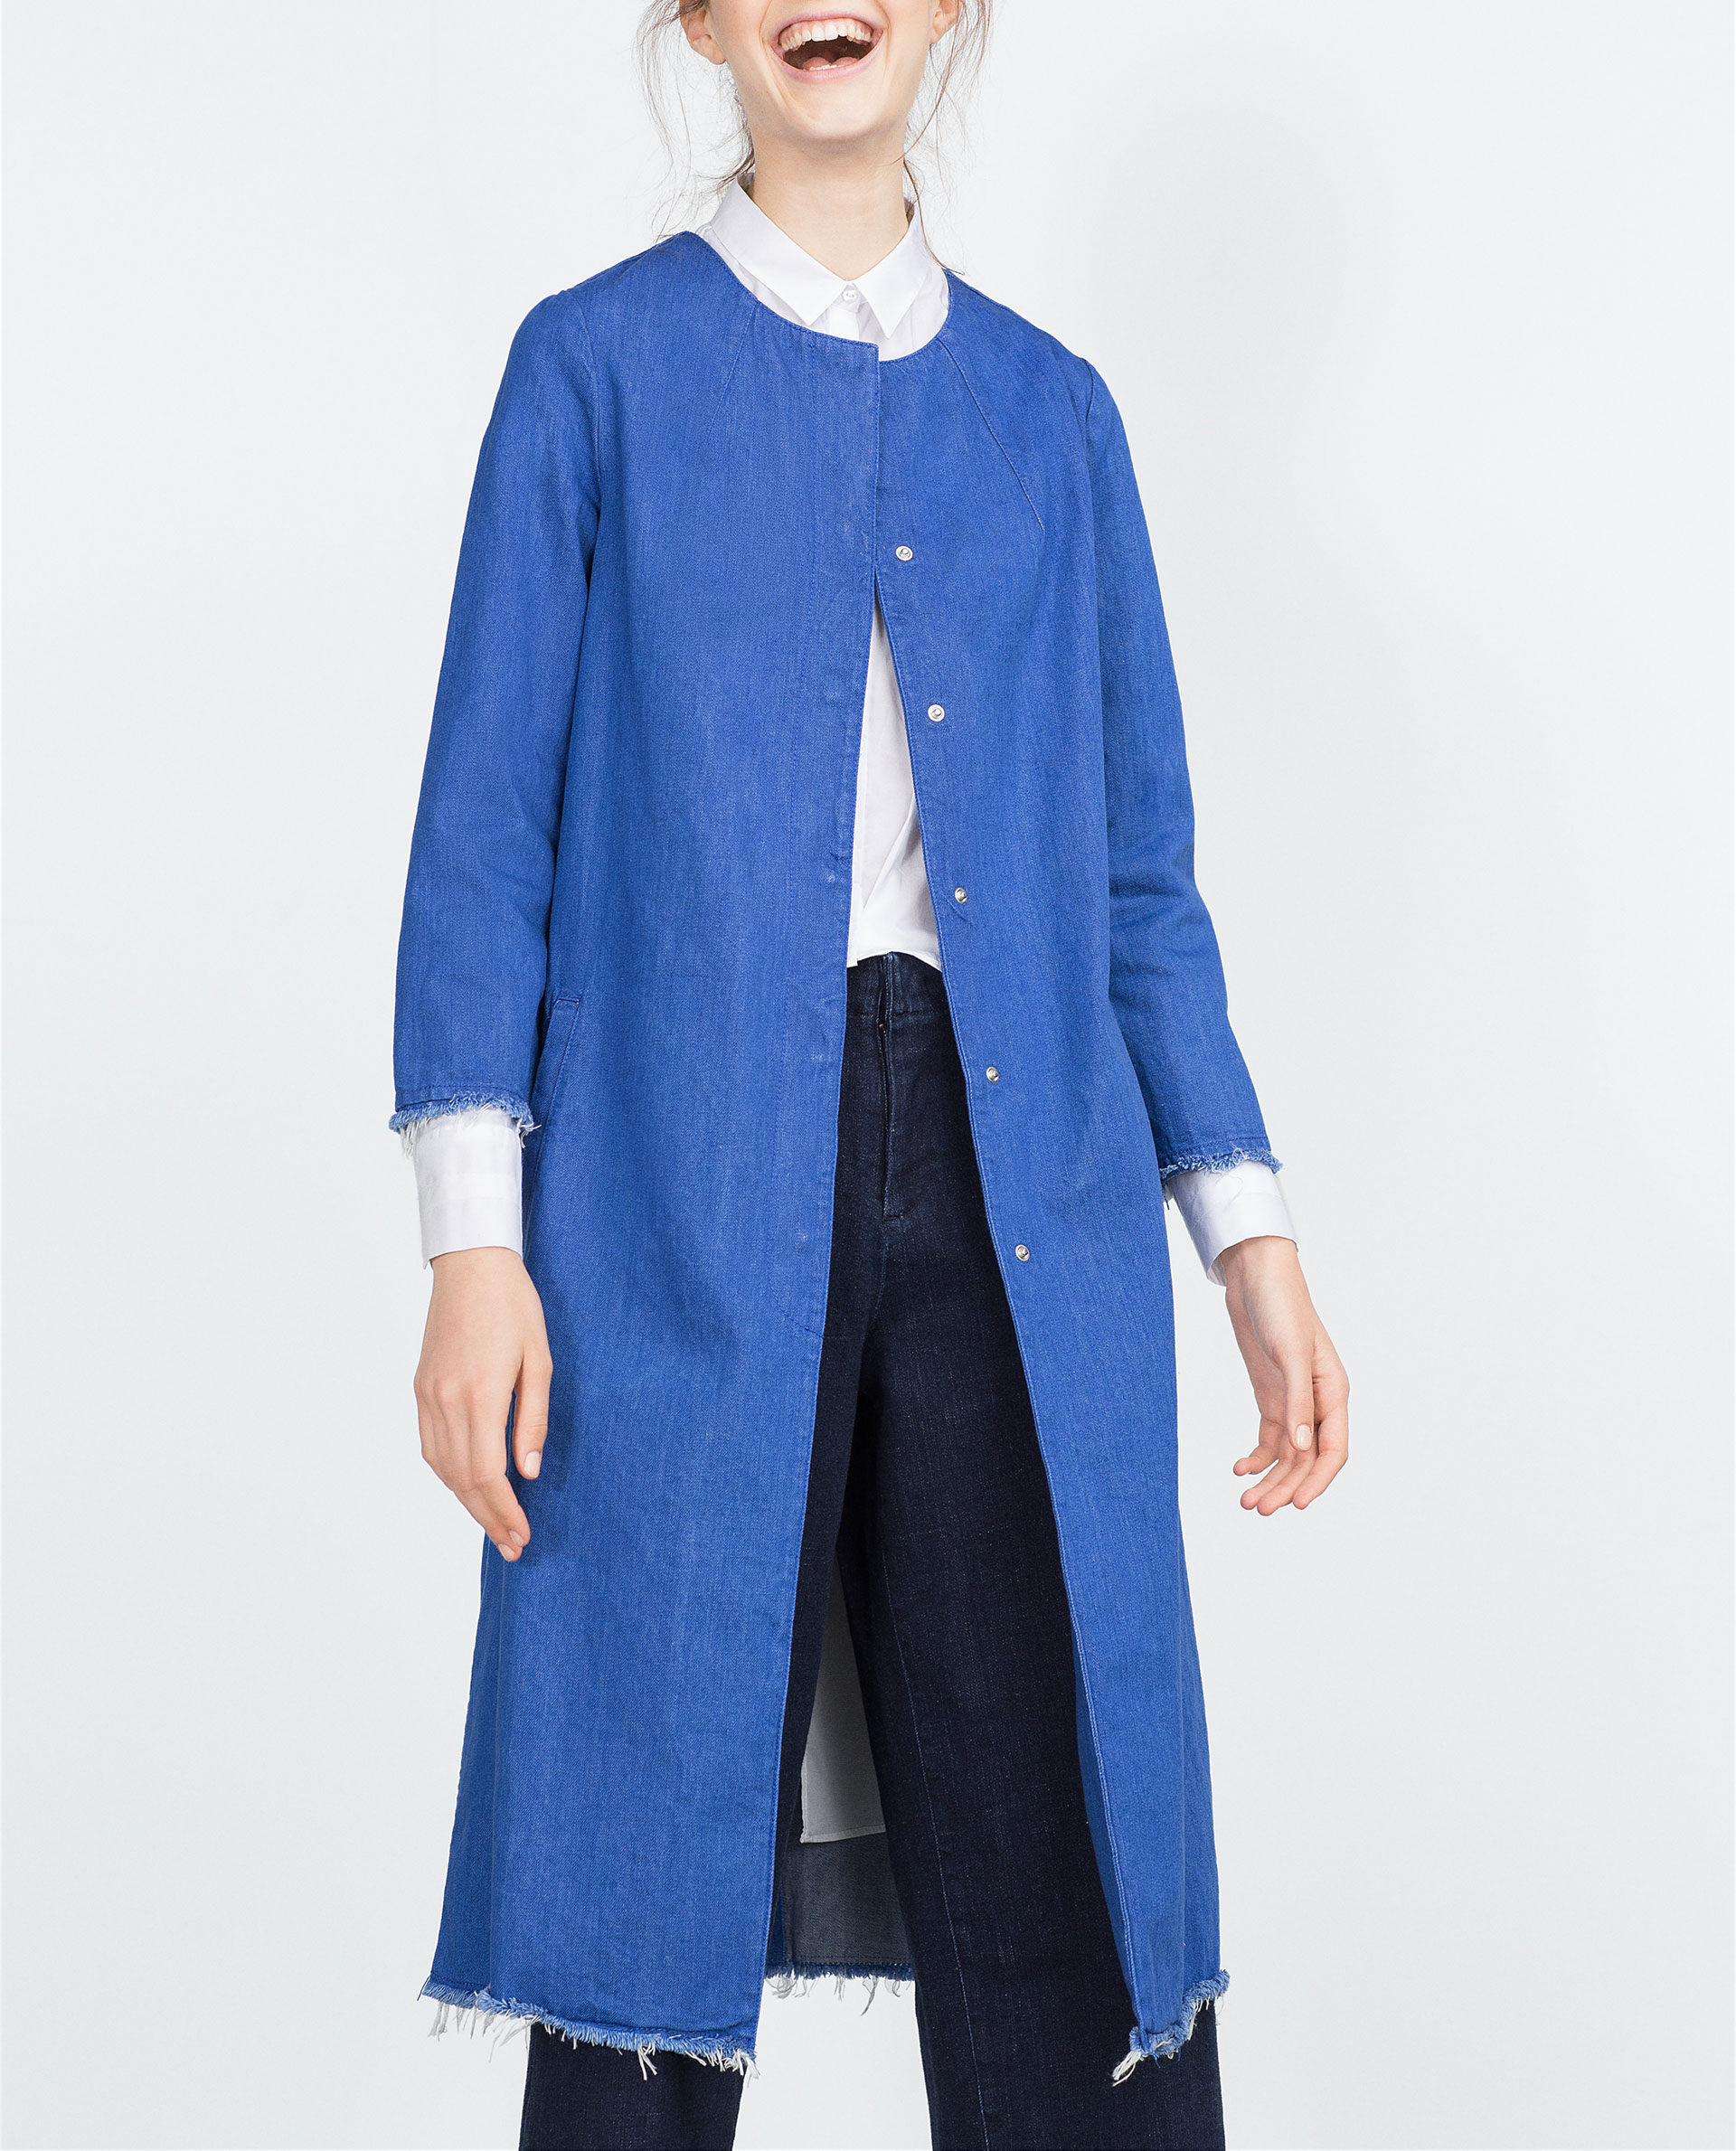 COAT - Coats - WOMAN | ZARA United States